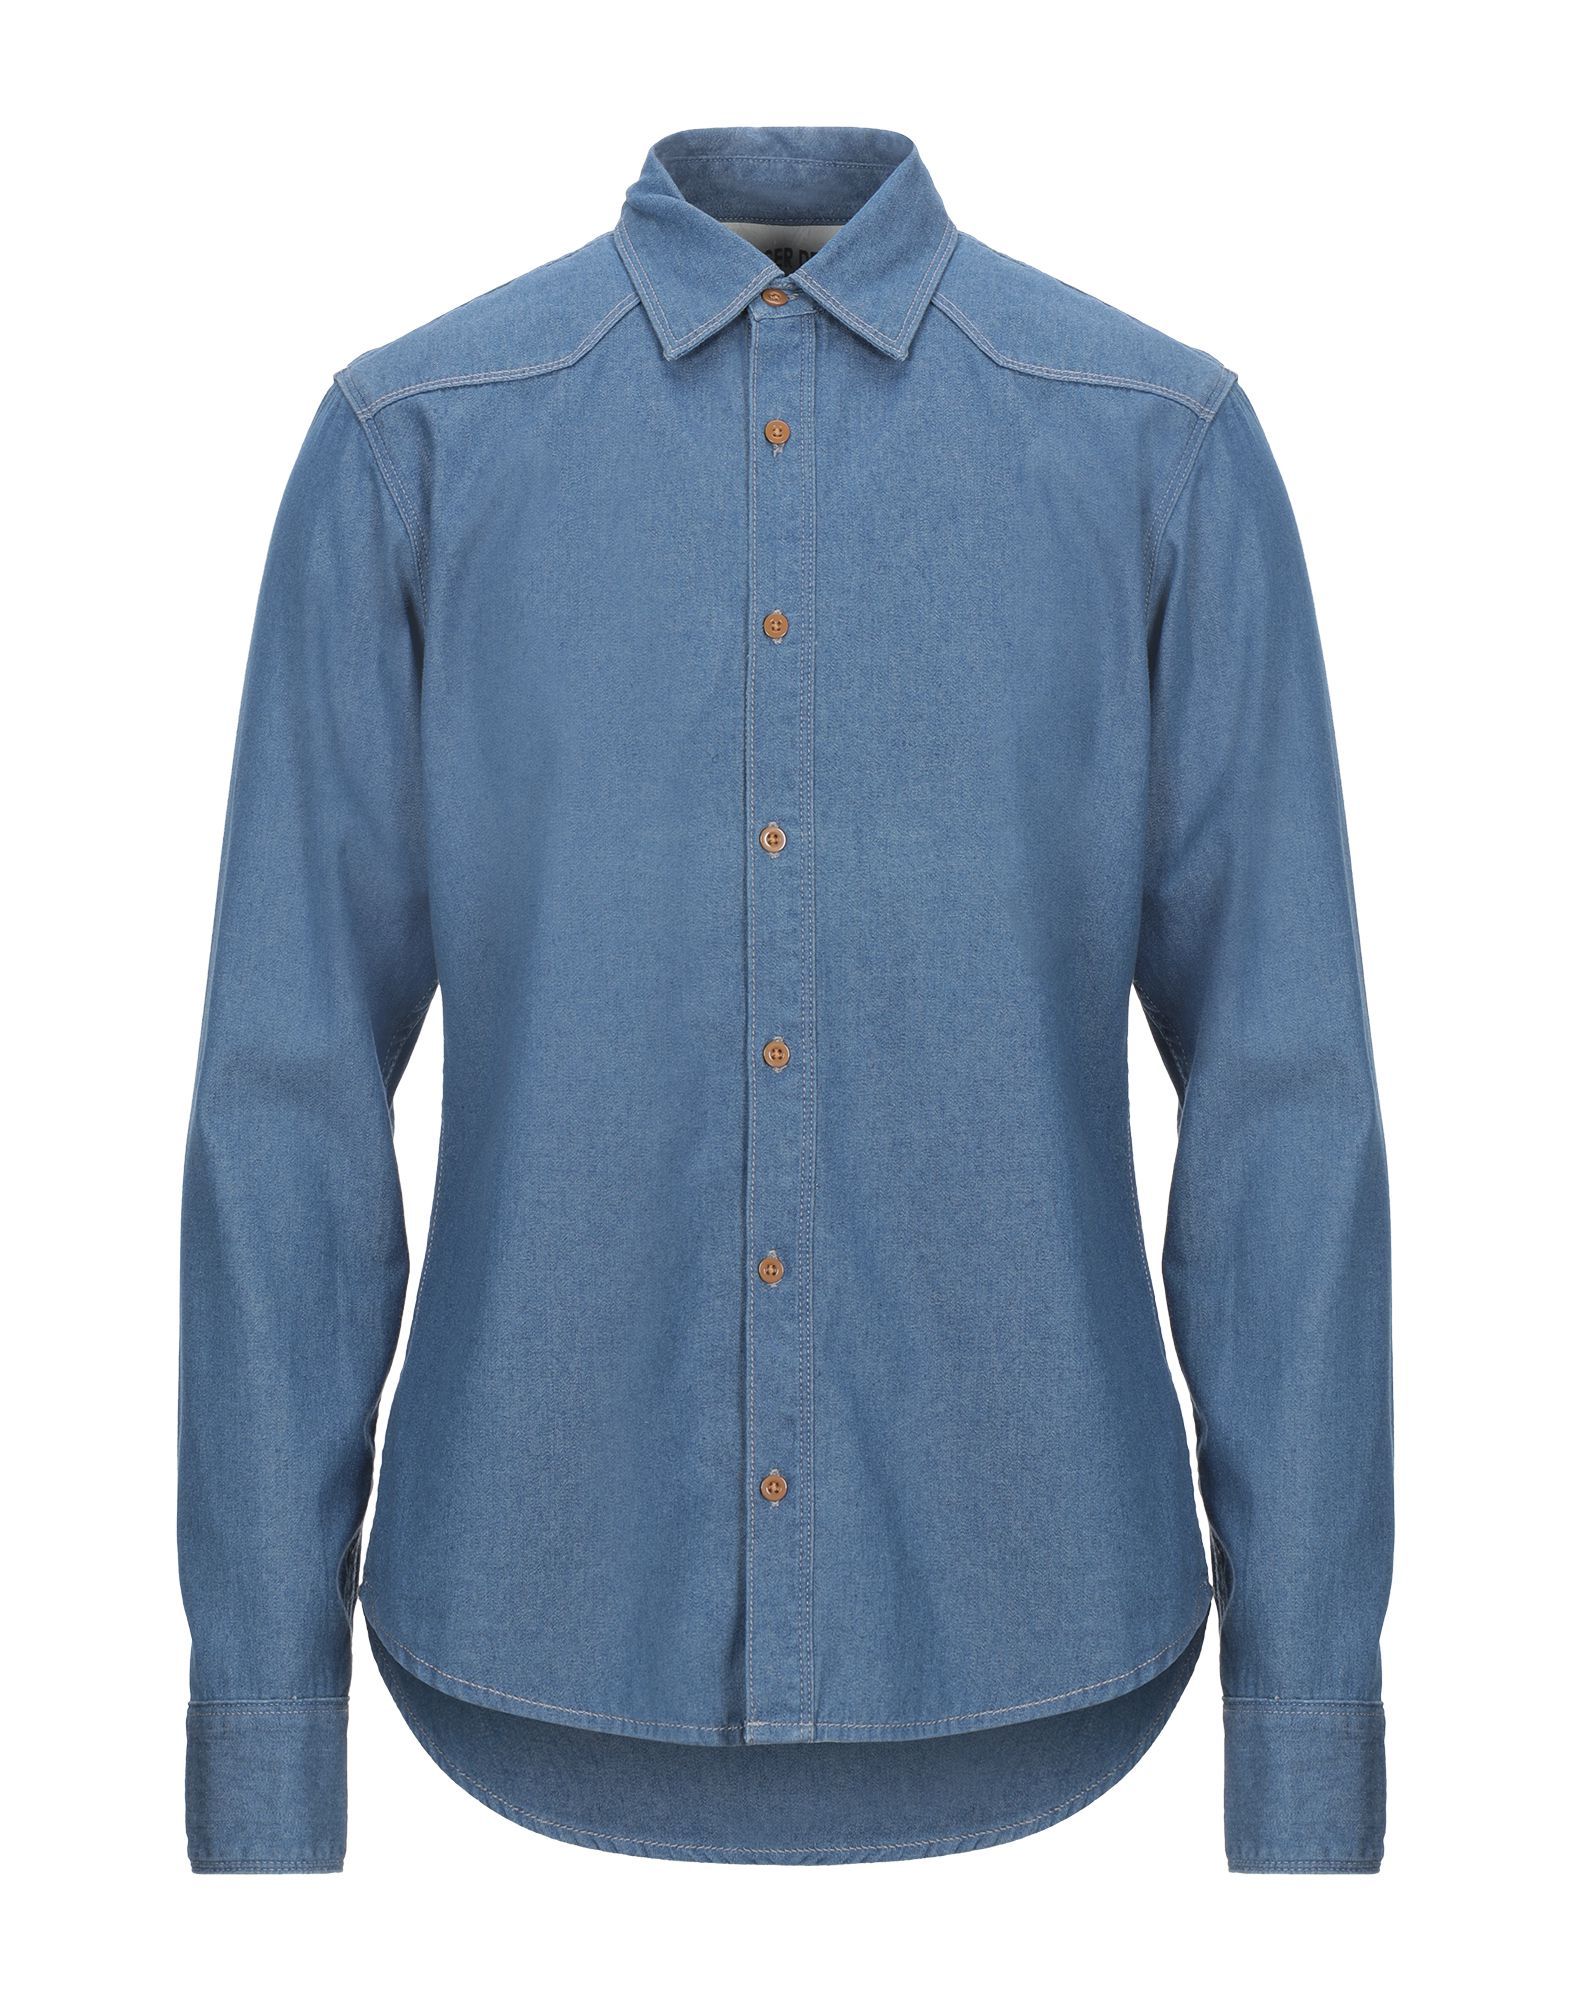 цена на TOMMY JEANS Джинсовая рубашка